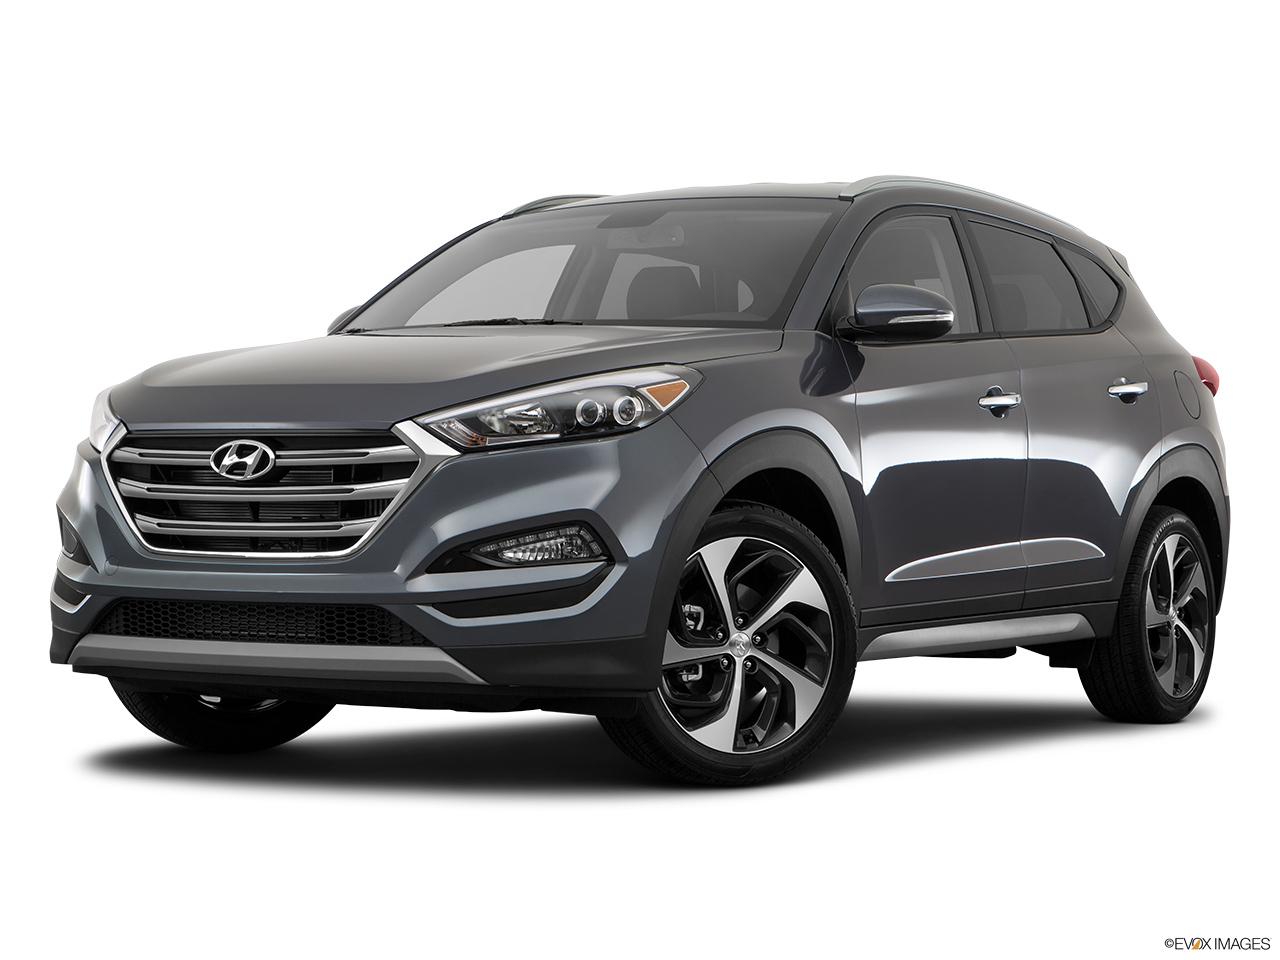 Lease A 2018 Hyundai Tucson 2 0l Automatic 2wd In Canada